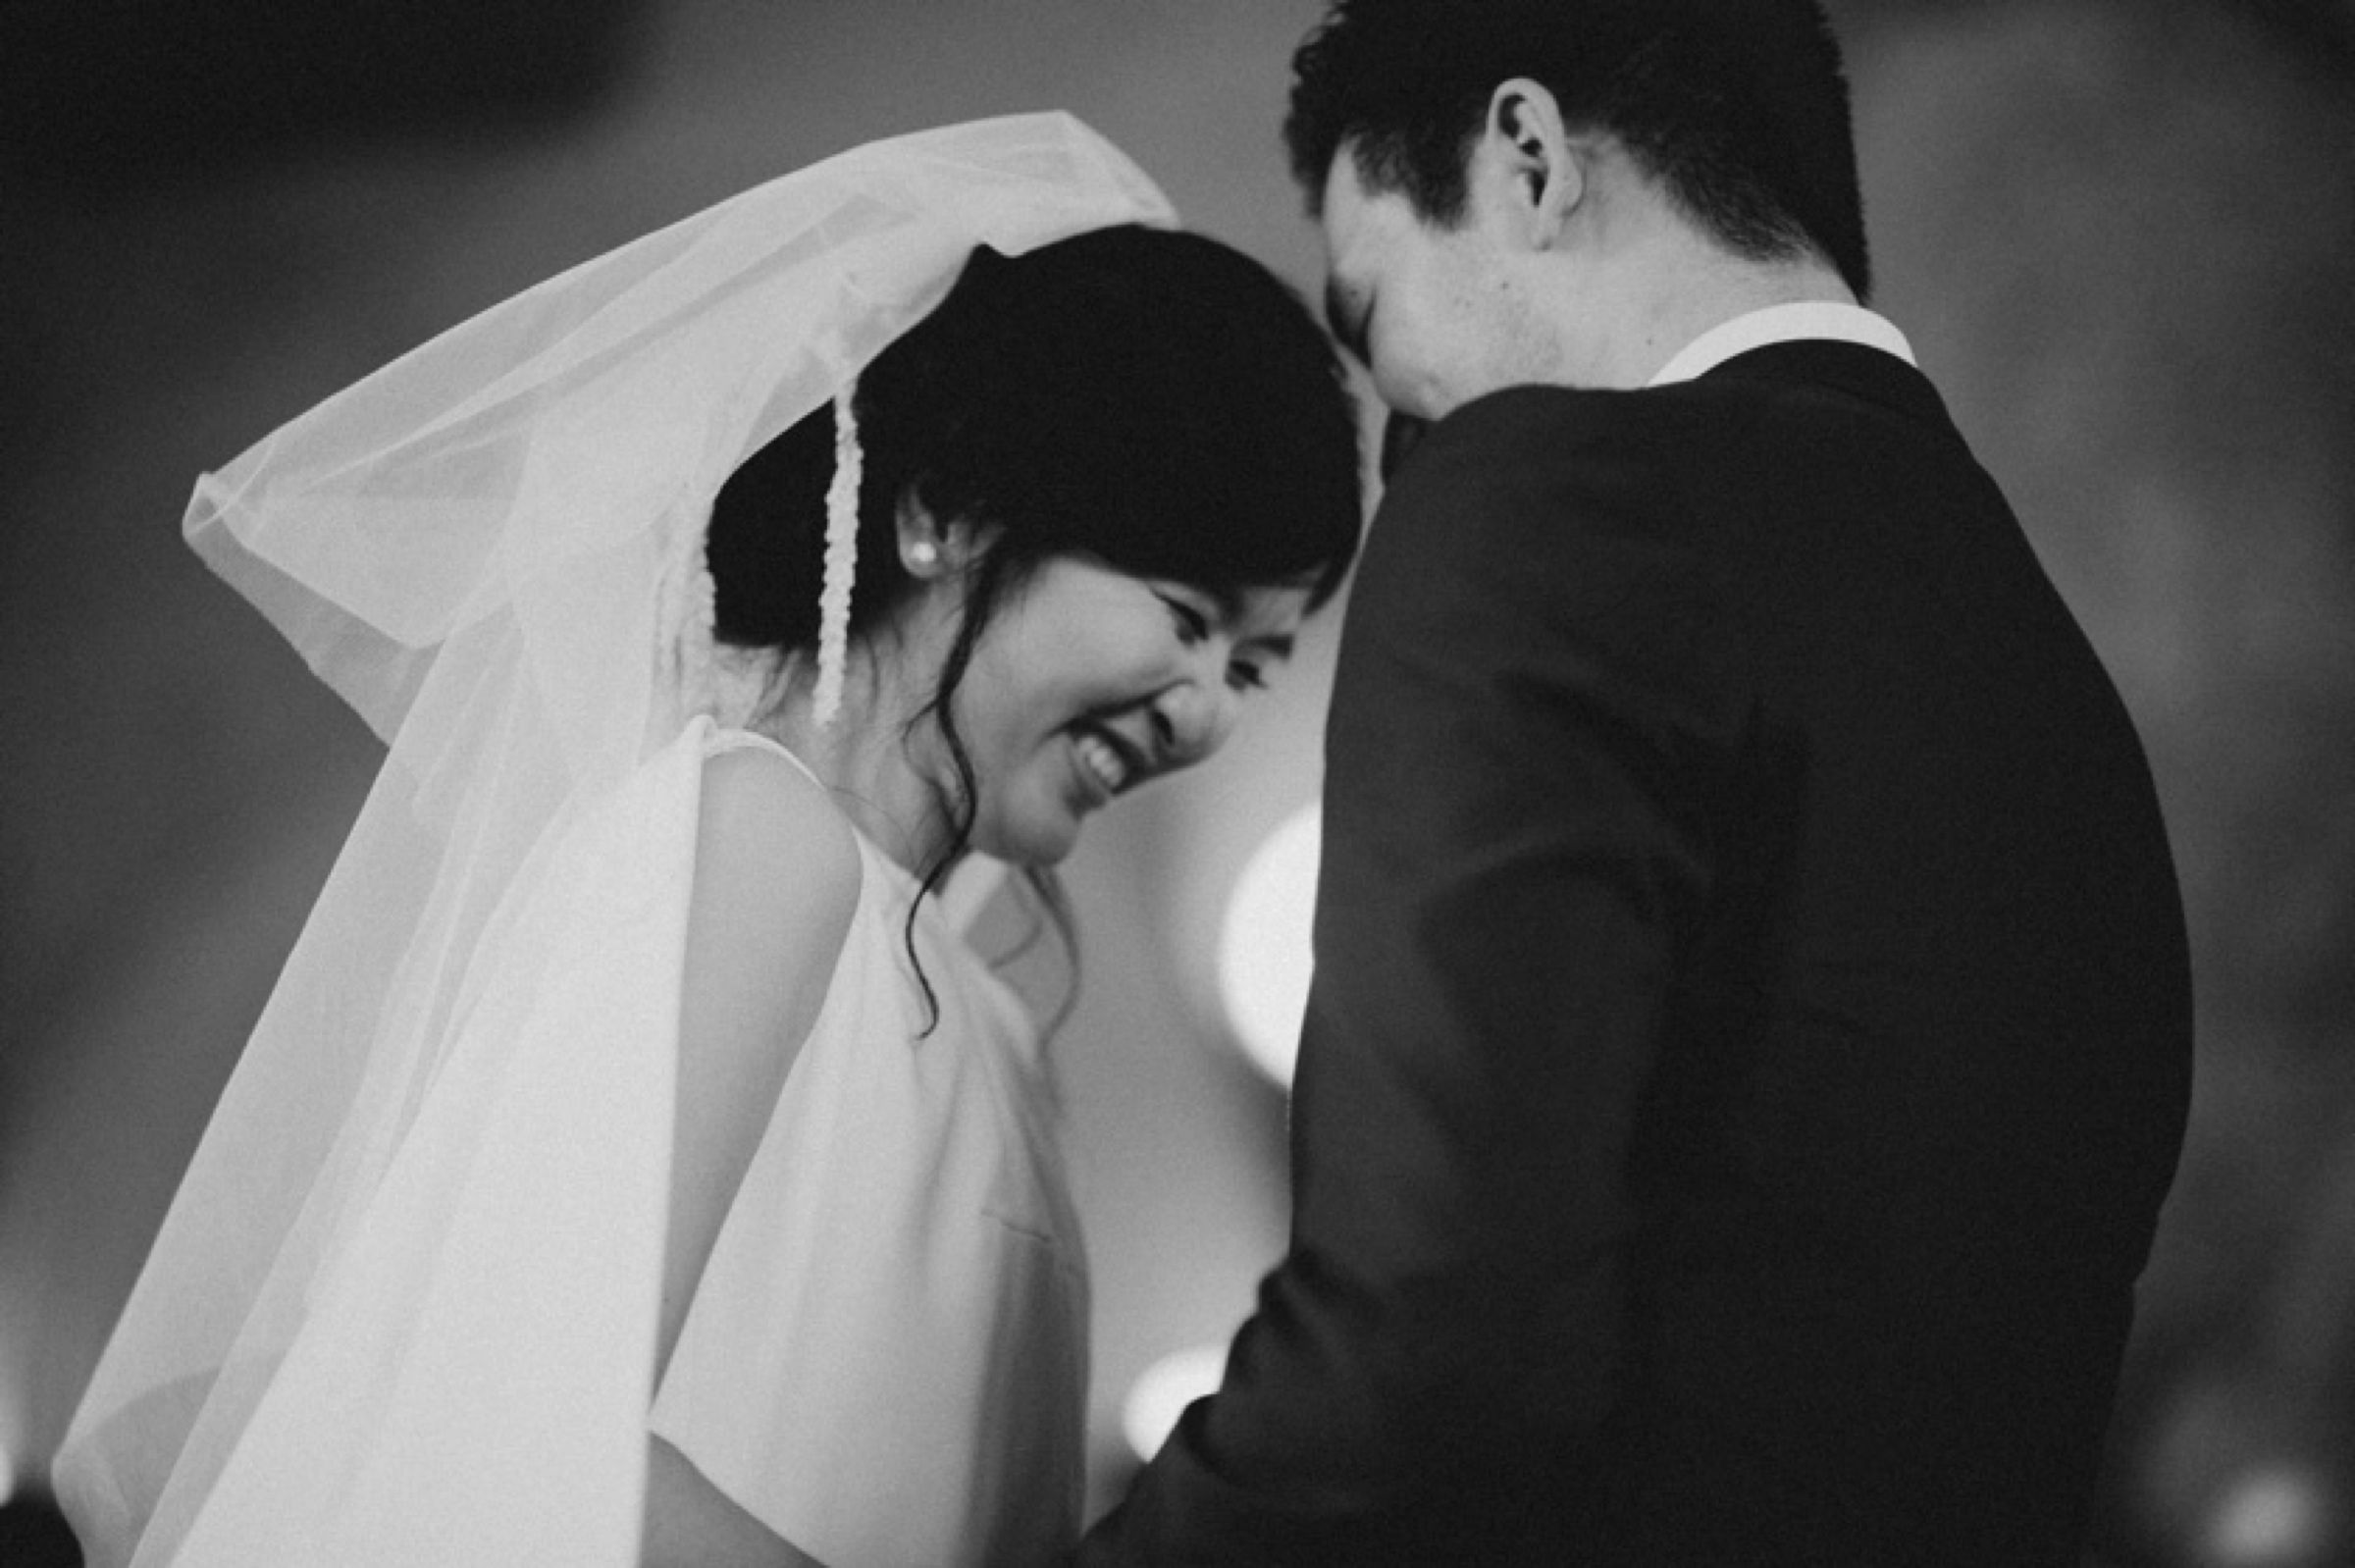 Tim-Danika-Bali-Wedding-Pyara-Photo-Evans 29.jpg